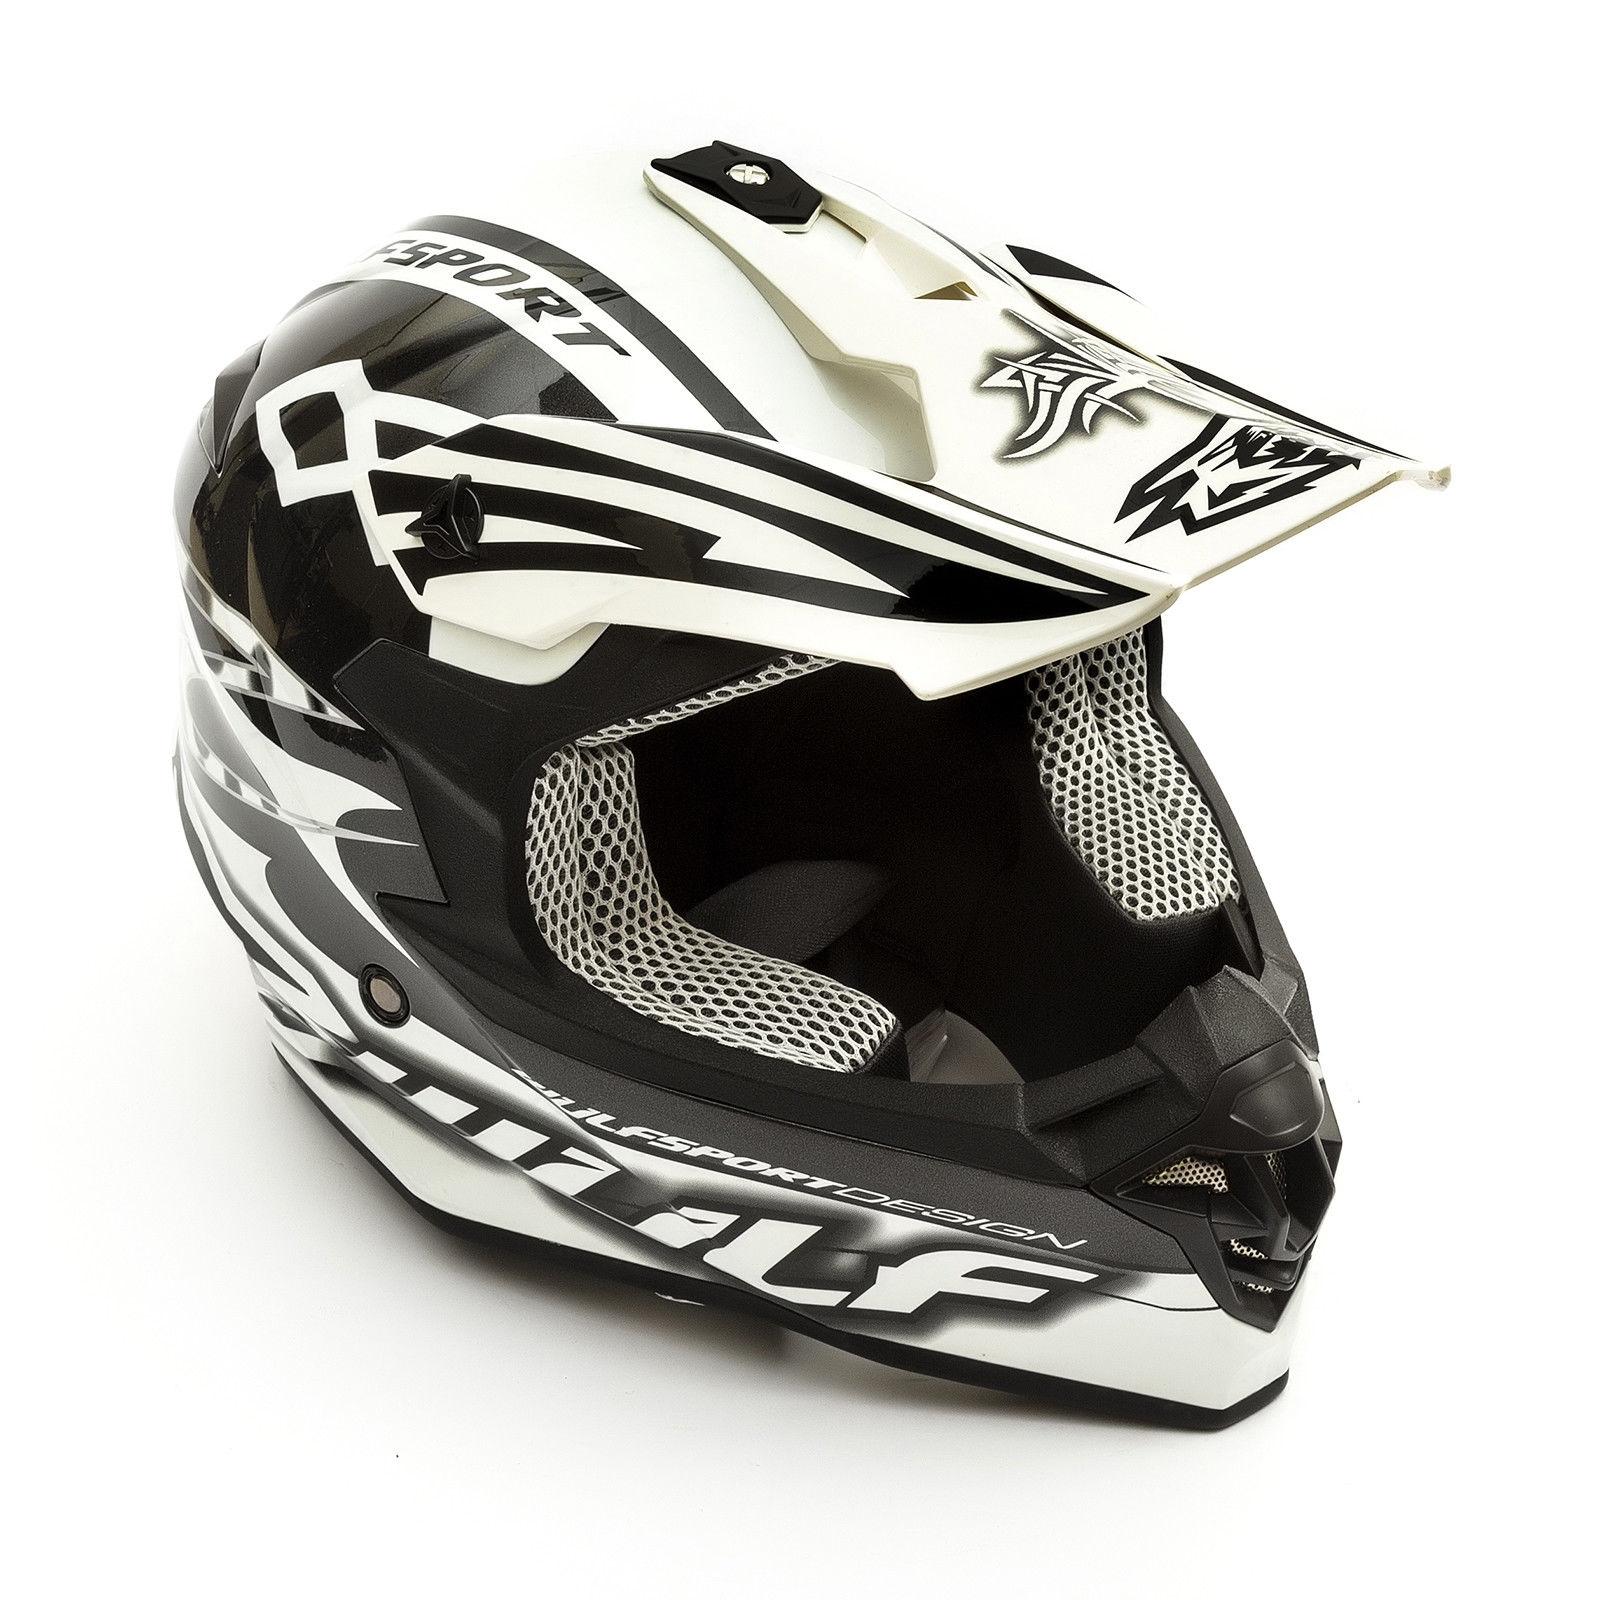 Wulfsport-Adult-Sceptre-Helmets-Motocross-Pitbike-Motorbike-Off-Road-Racing-ATV thumbnail 57